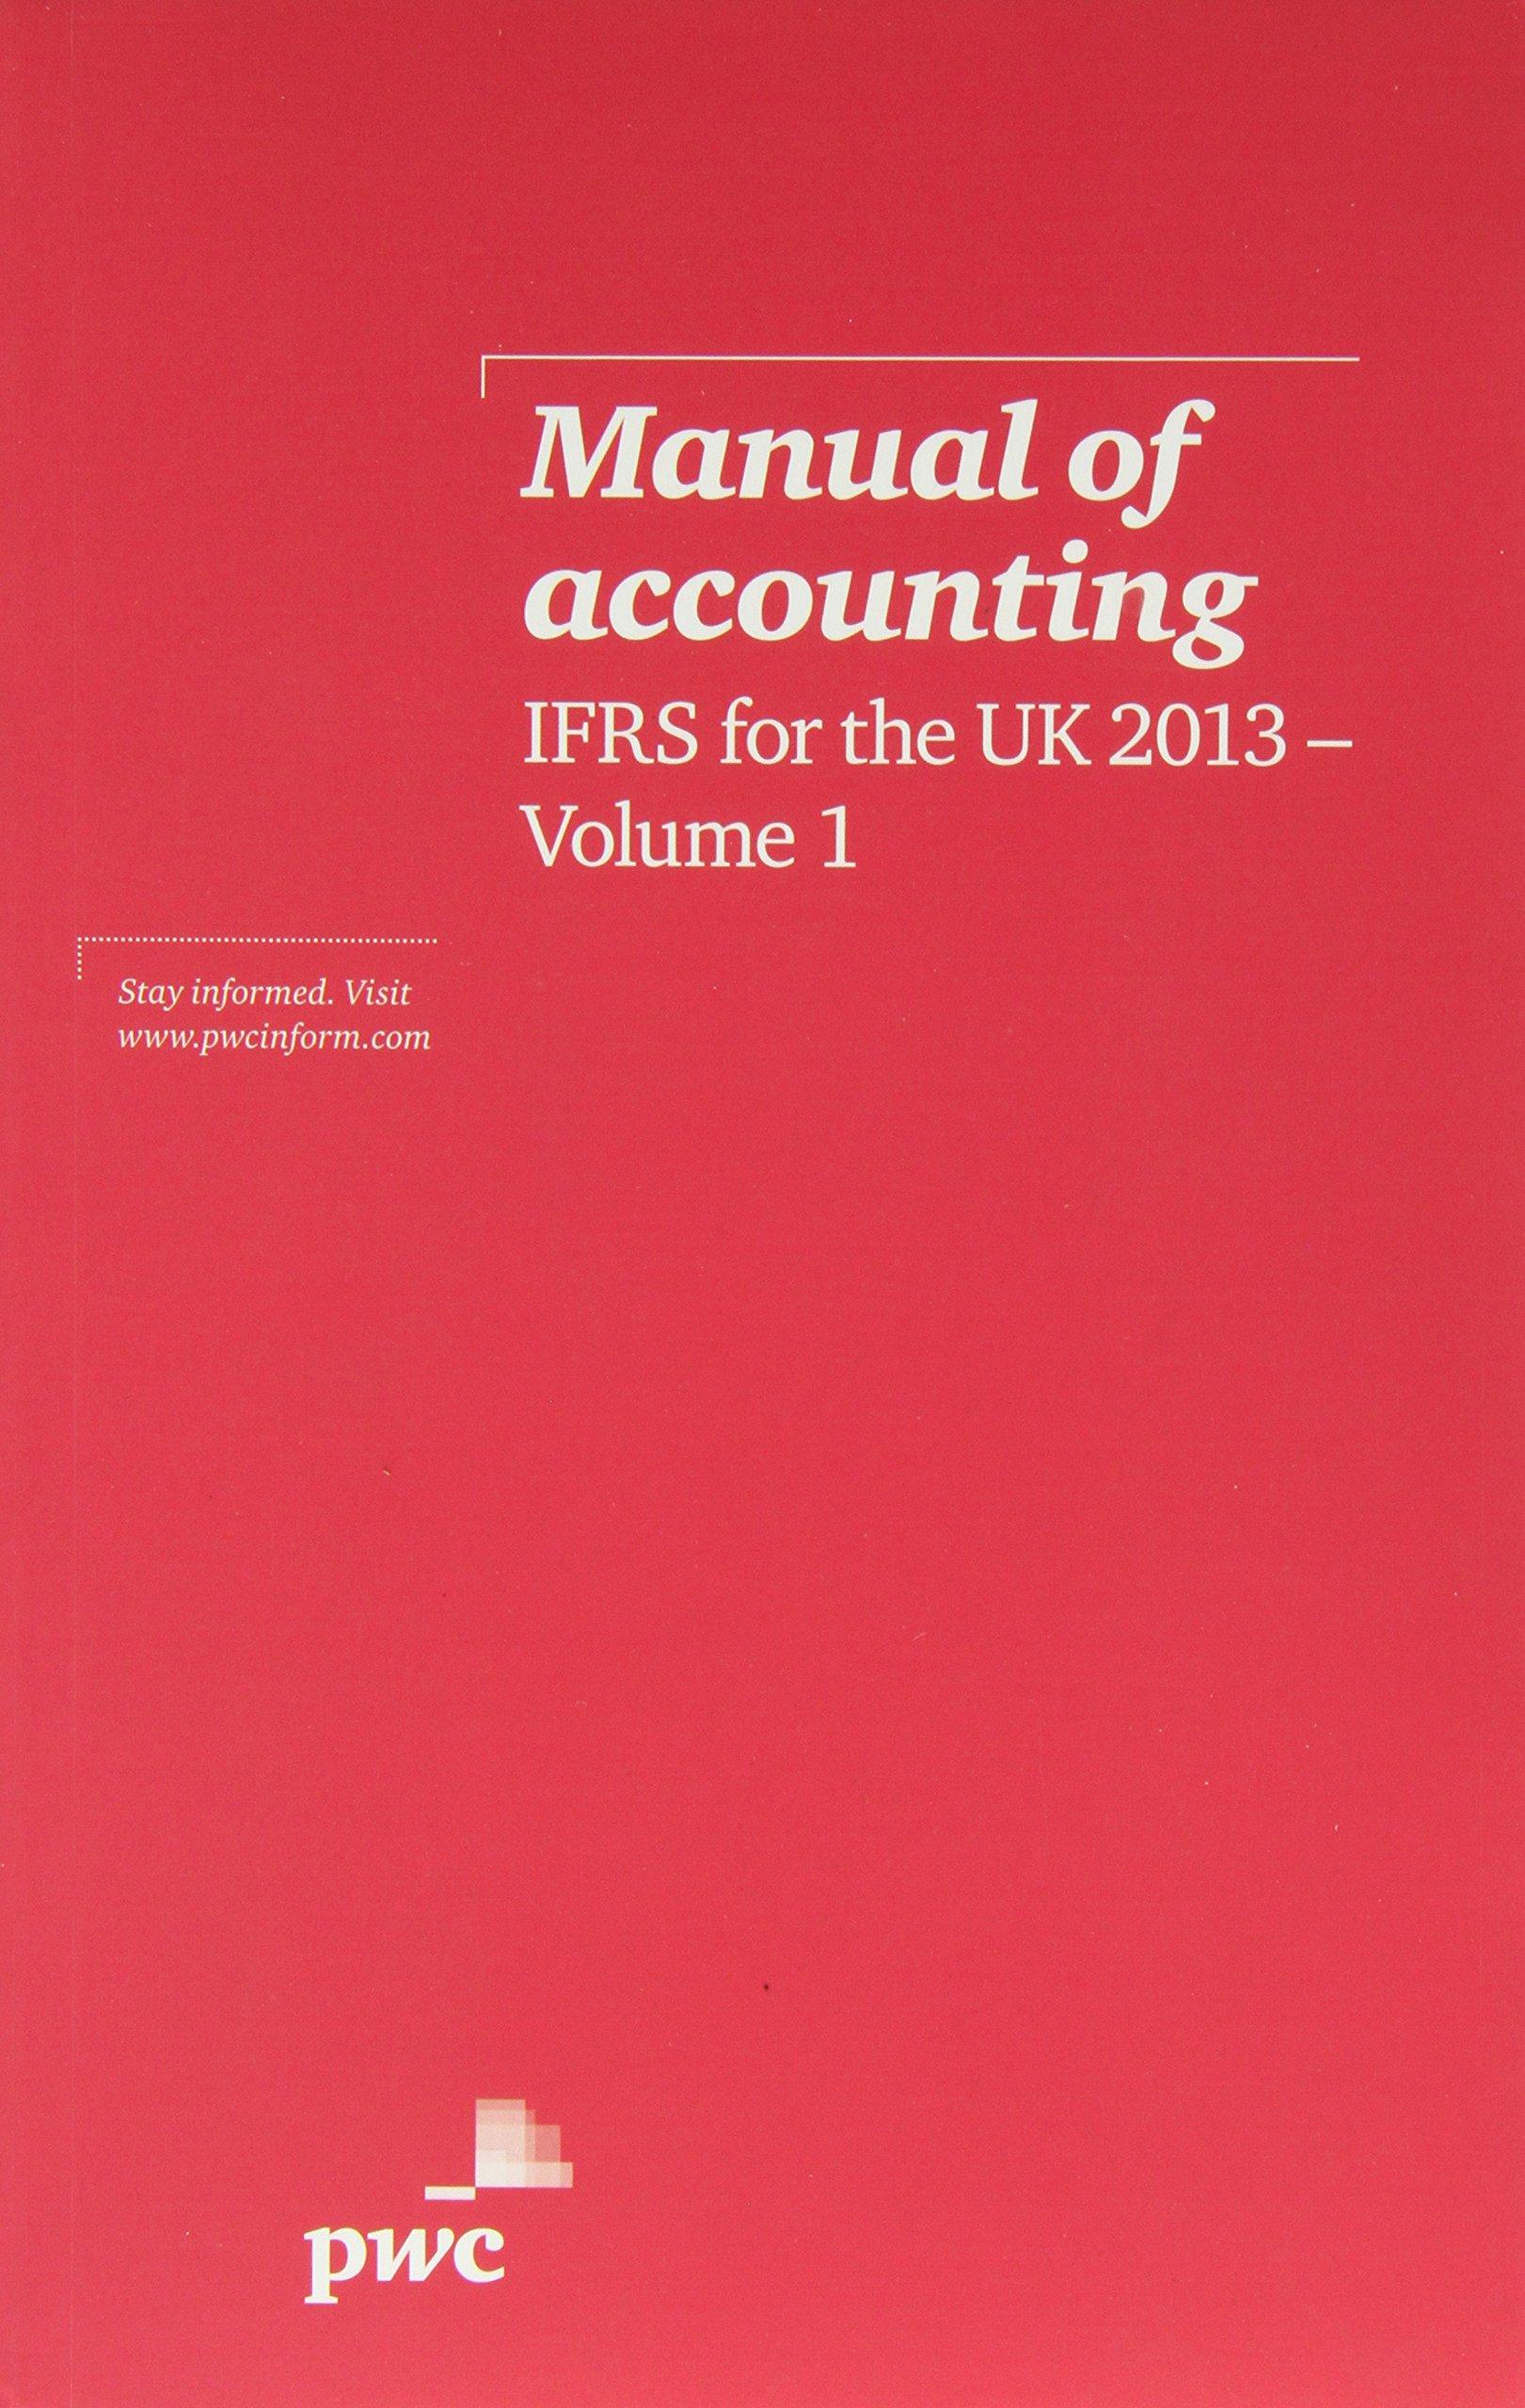 PwC IFRS Reporting 2013 Pack: Amazon.co.uk: PricewaterhouseCoopers:  9781780430119: Books